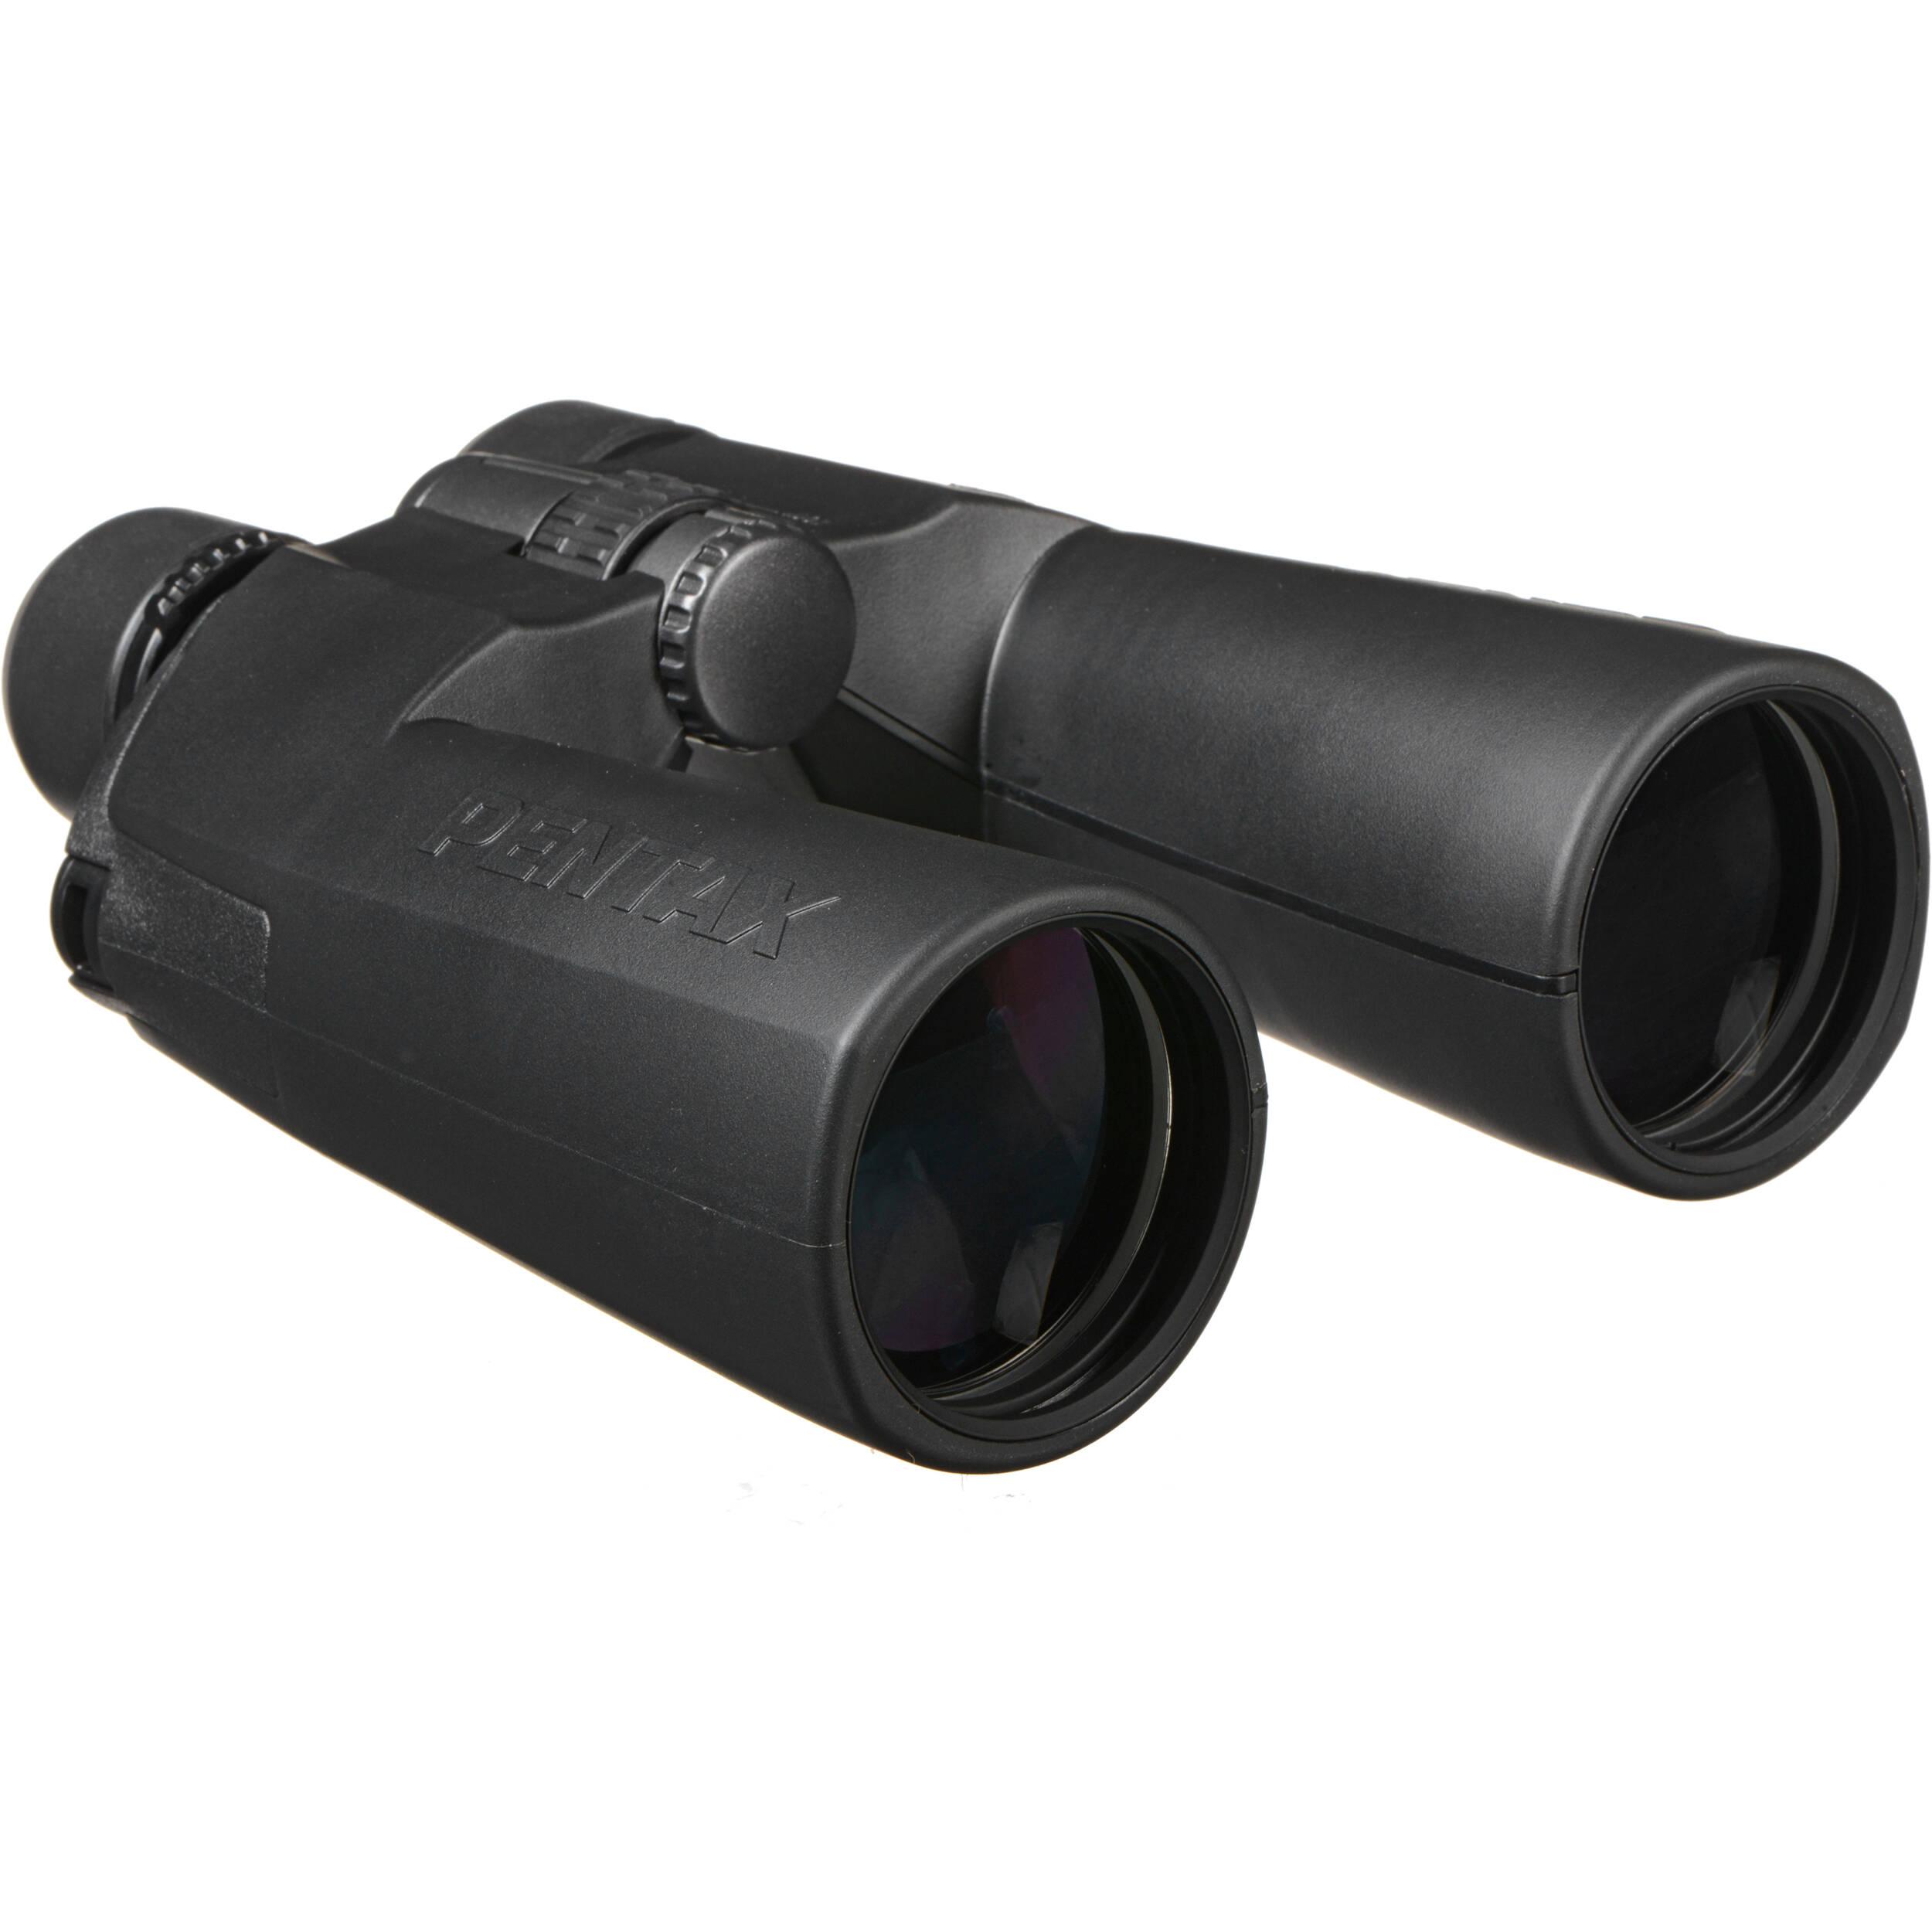 pentax 20x60 s series sp wp binocular 65874 b h photo video rh bhphotovideo com Pentax Binos Pentax 20X60